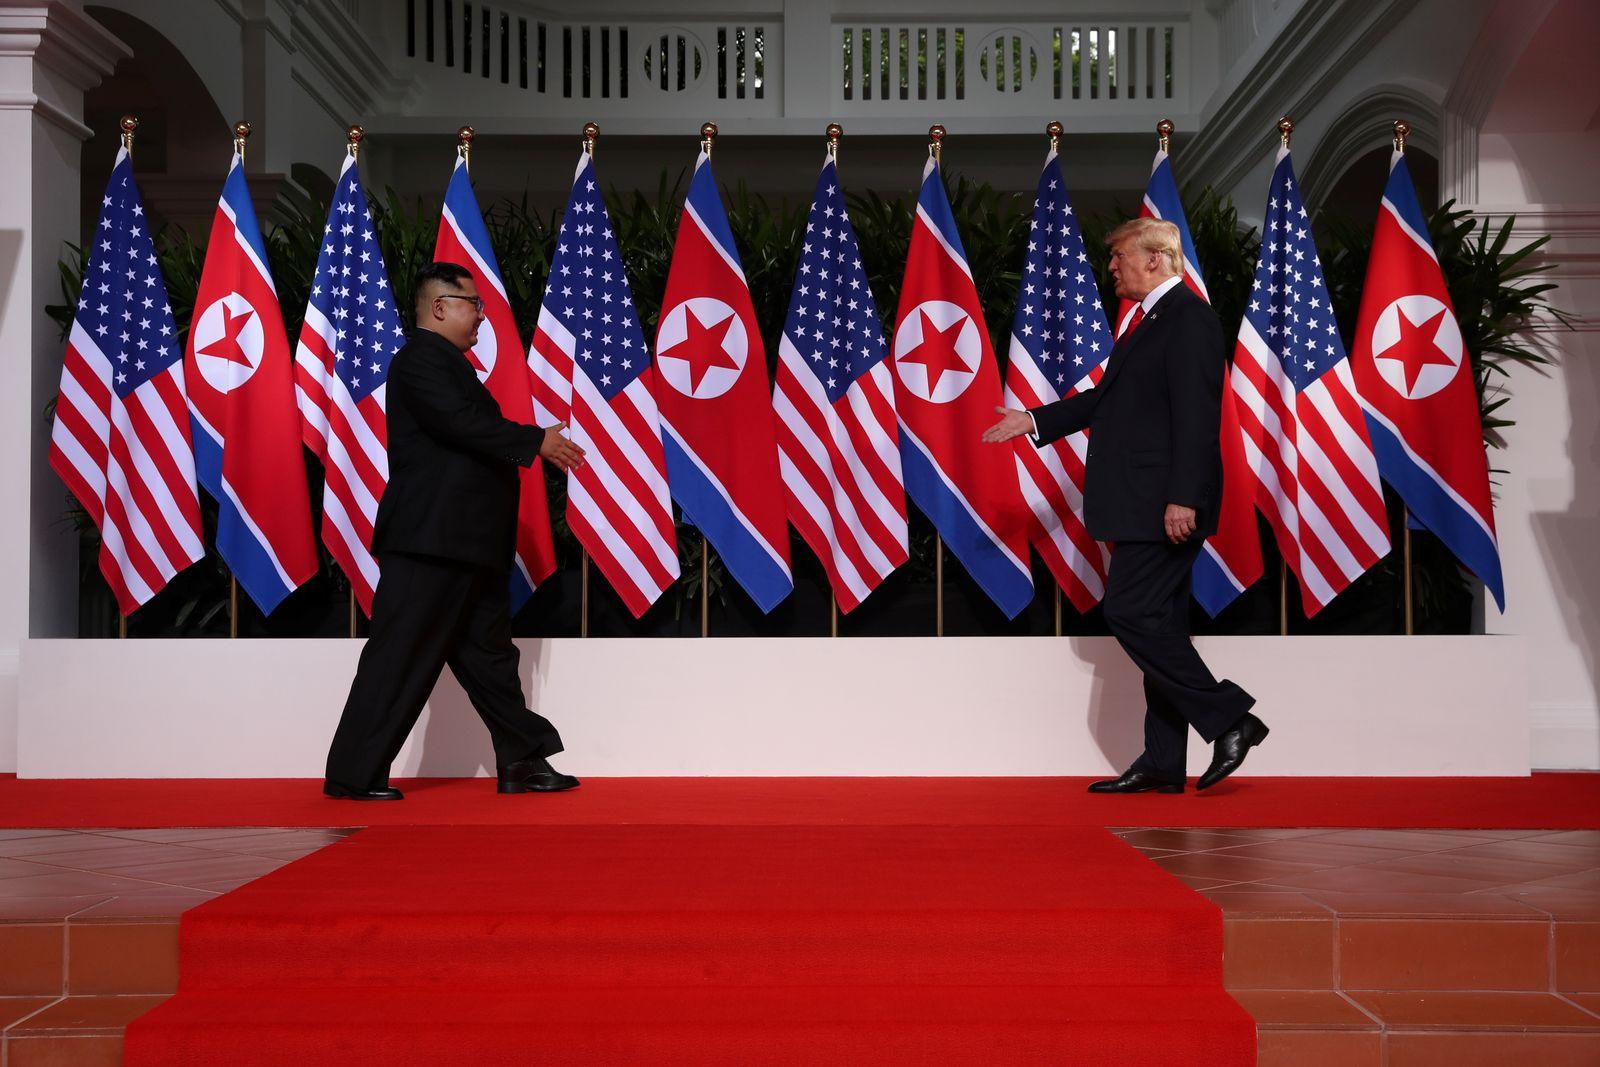 Kim Jong Un / Donald Trump / Hosen